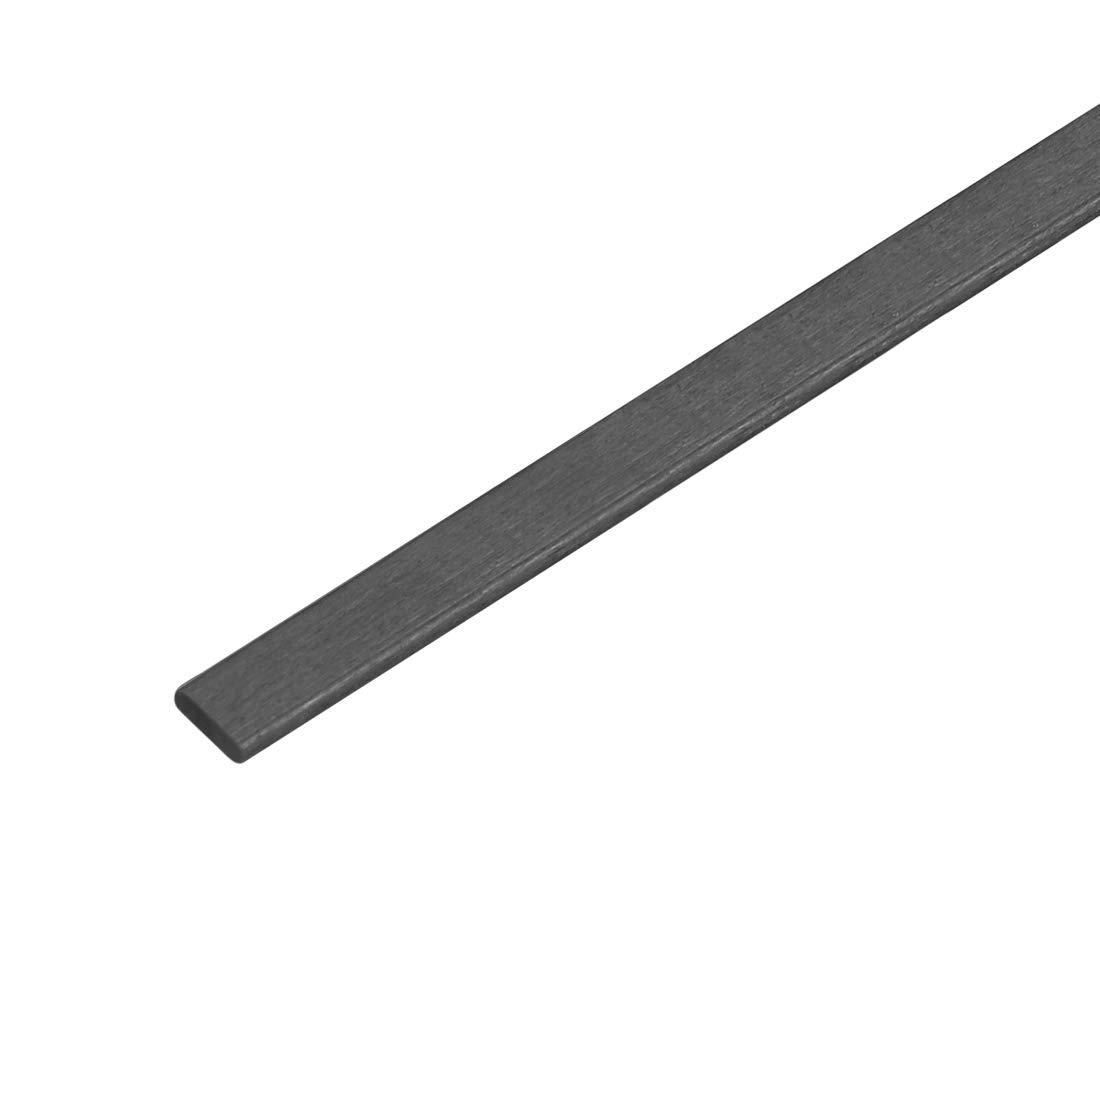 Carbon Fiber Strip 1mm Thickness x 3mm Width x 600mm Pultruded Bar 5 Pcs